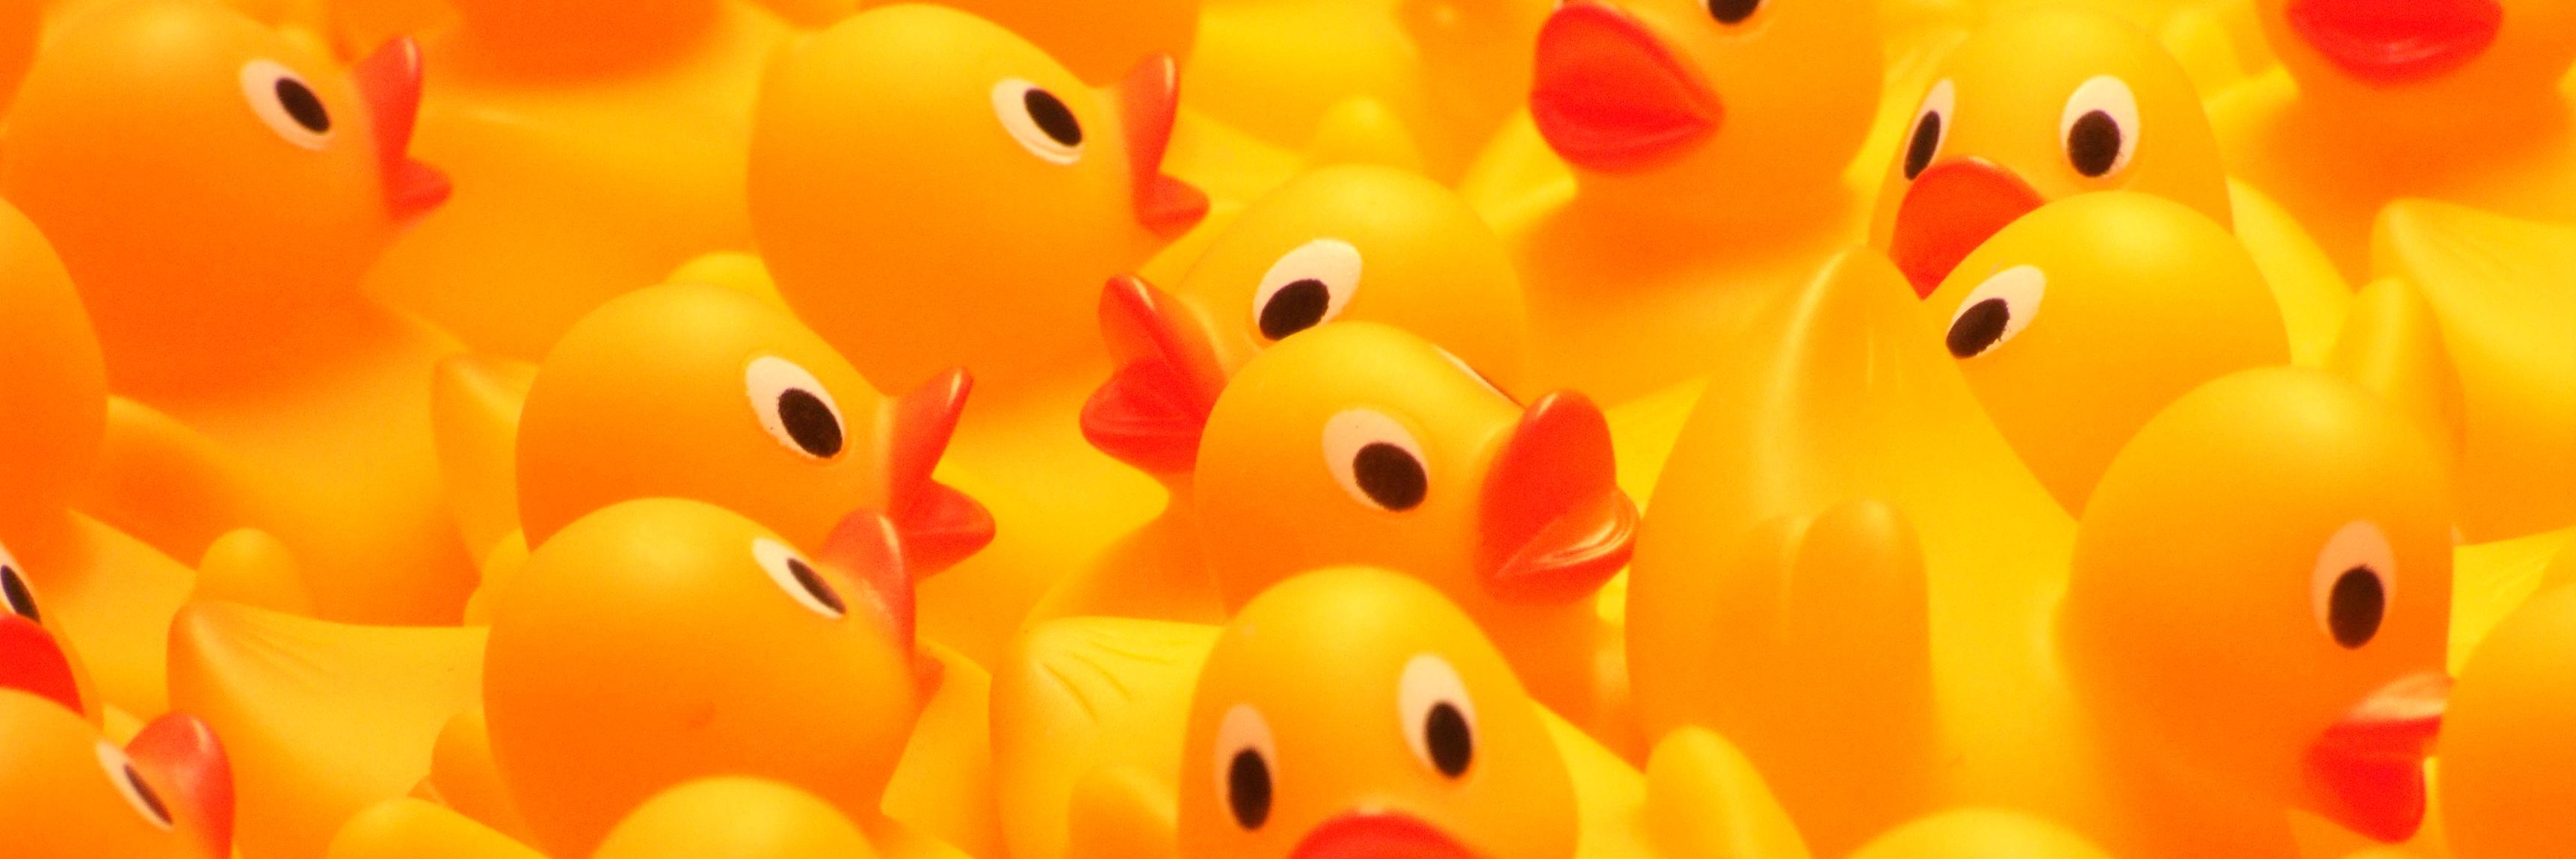 Rubber duckies so many ducks